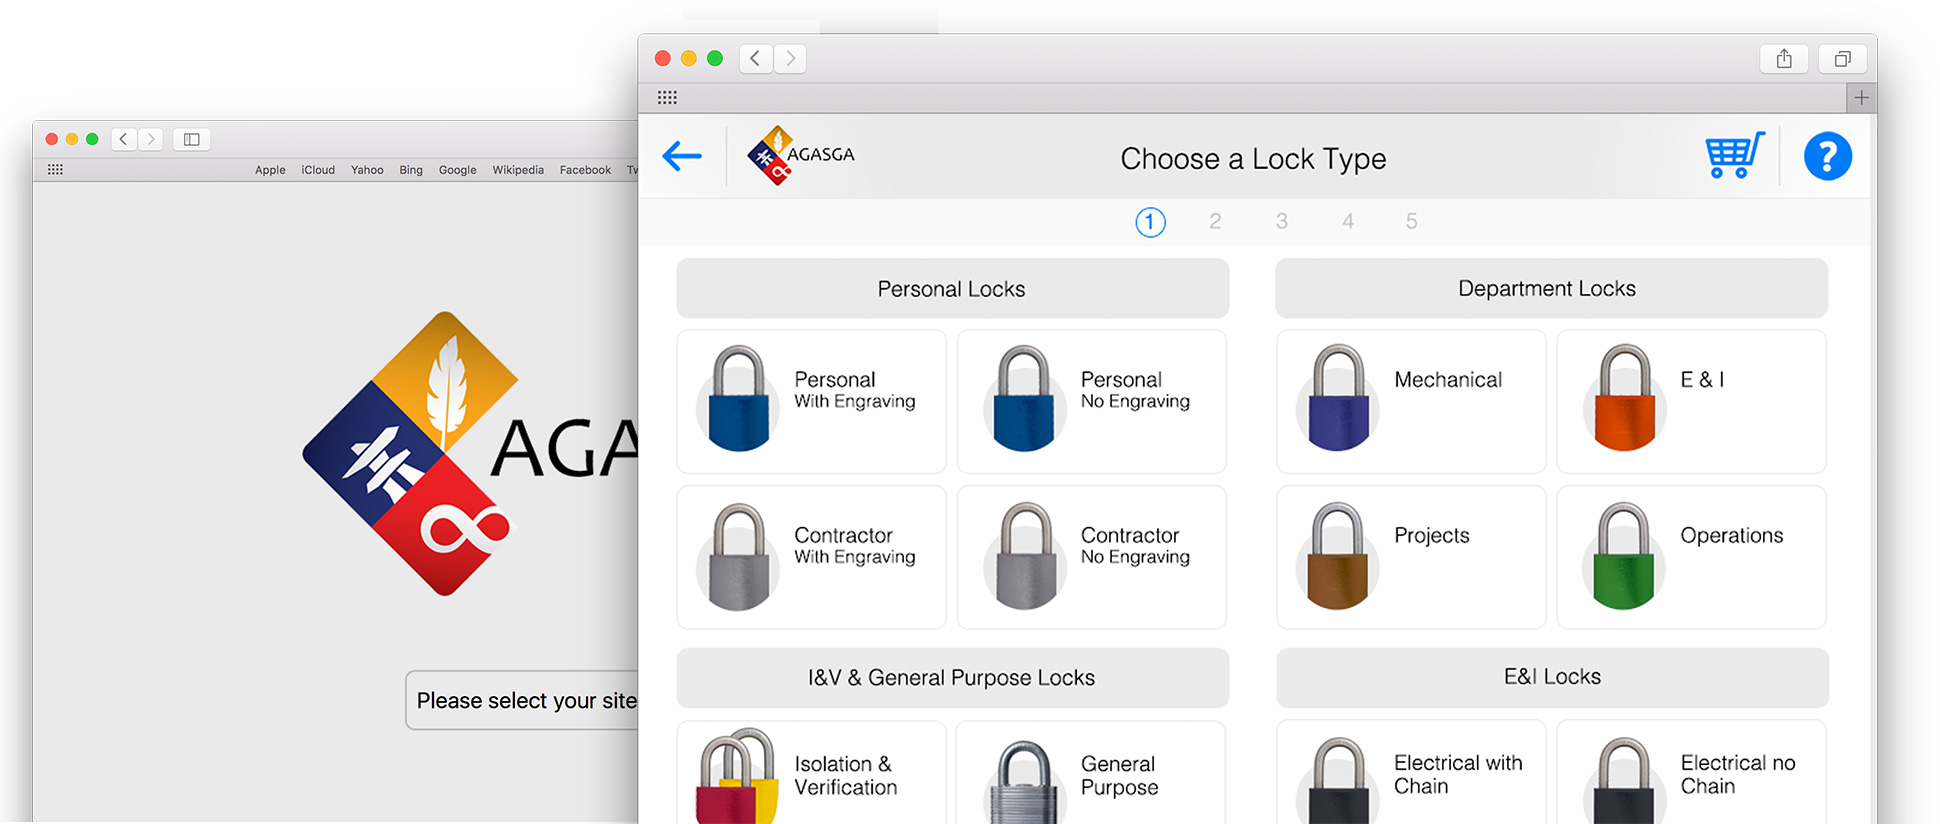 lockout-tagout (loto) – agasga